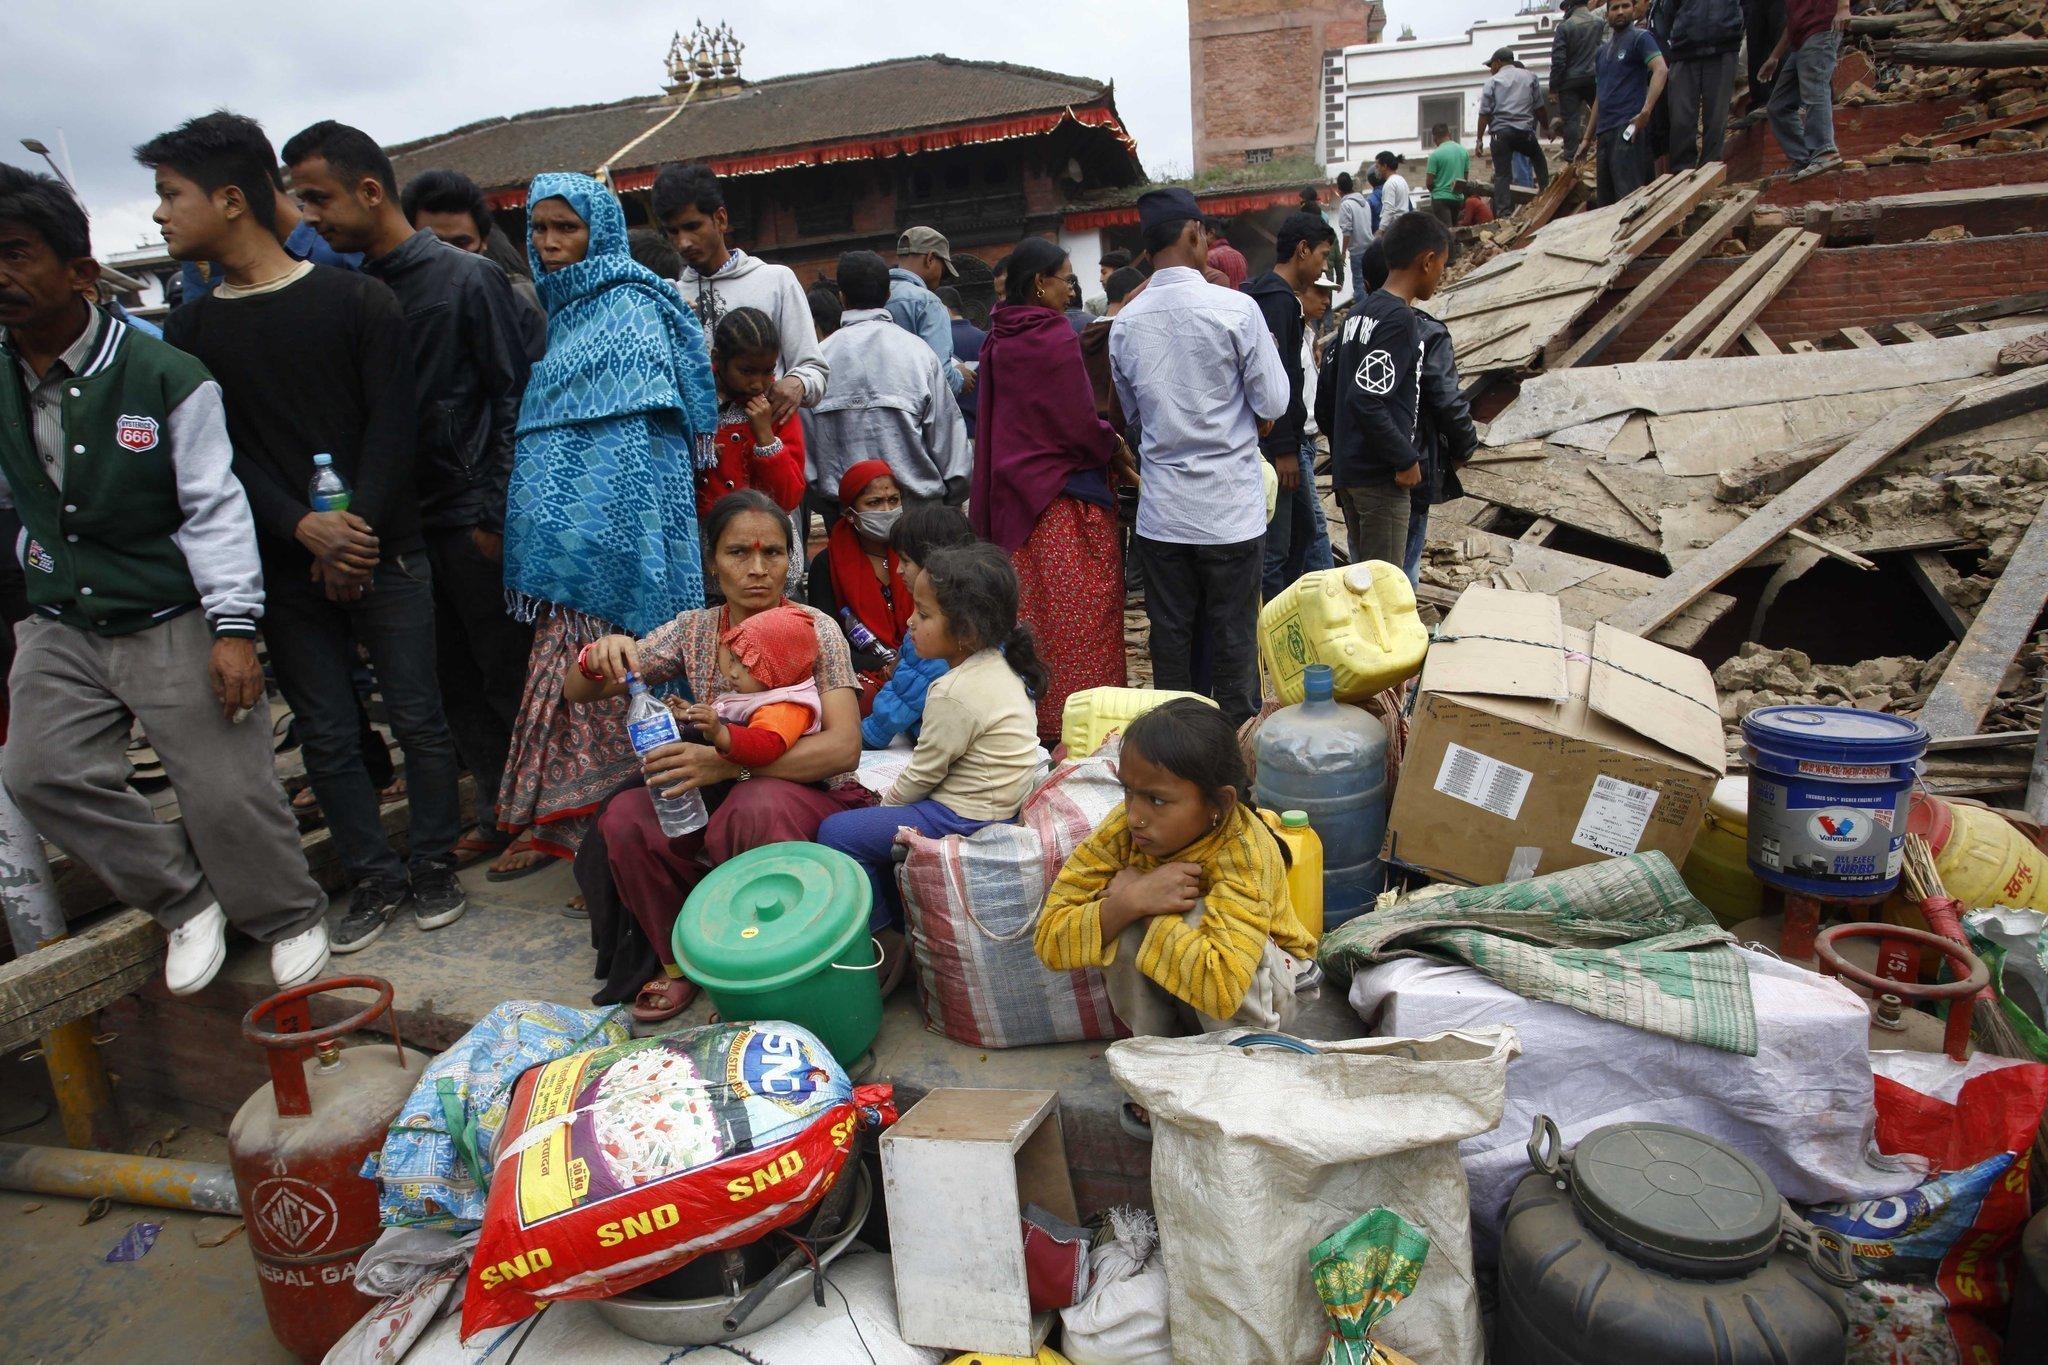 Katmandu's poorly constructed buildings worsen quake outcome